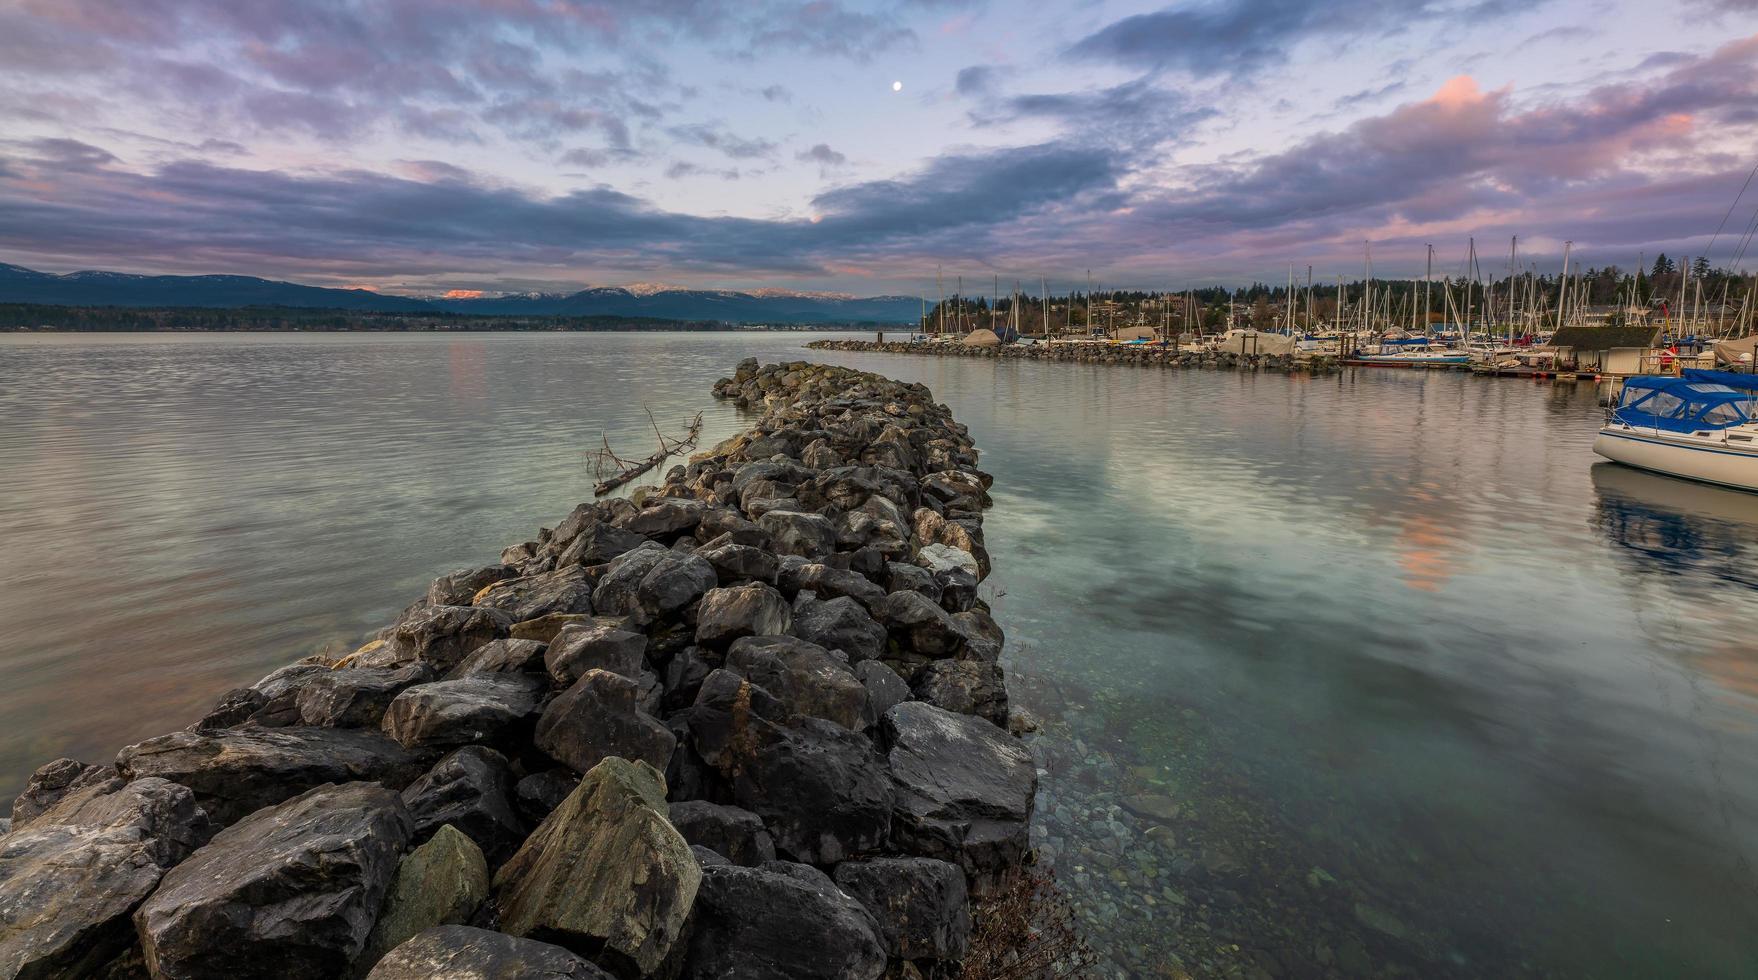 Gray rocks near body of water under blue sky photo